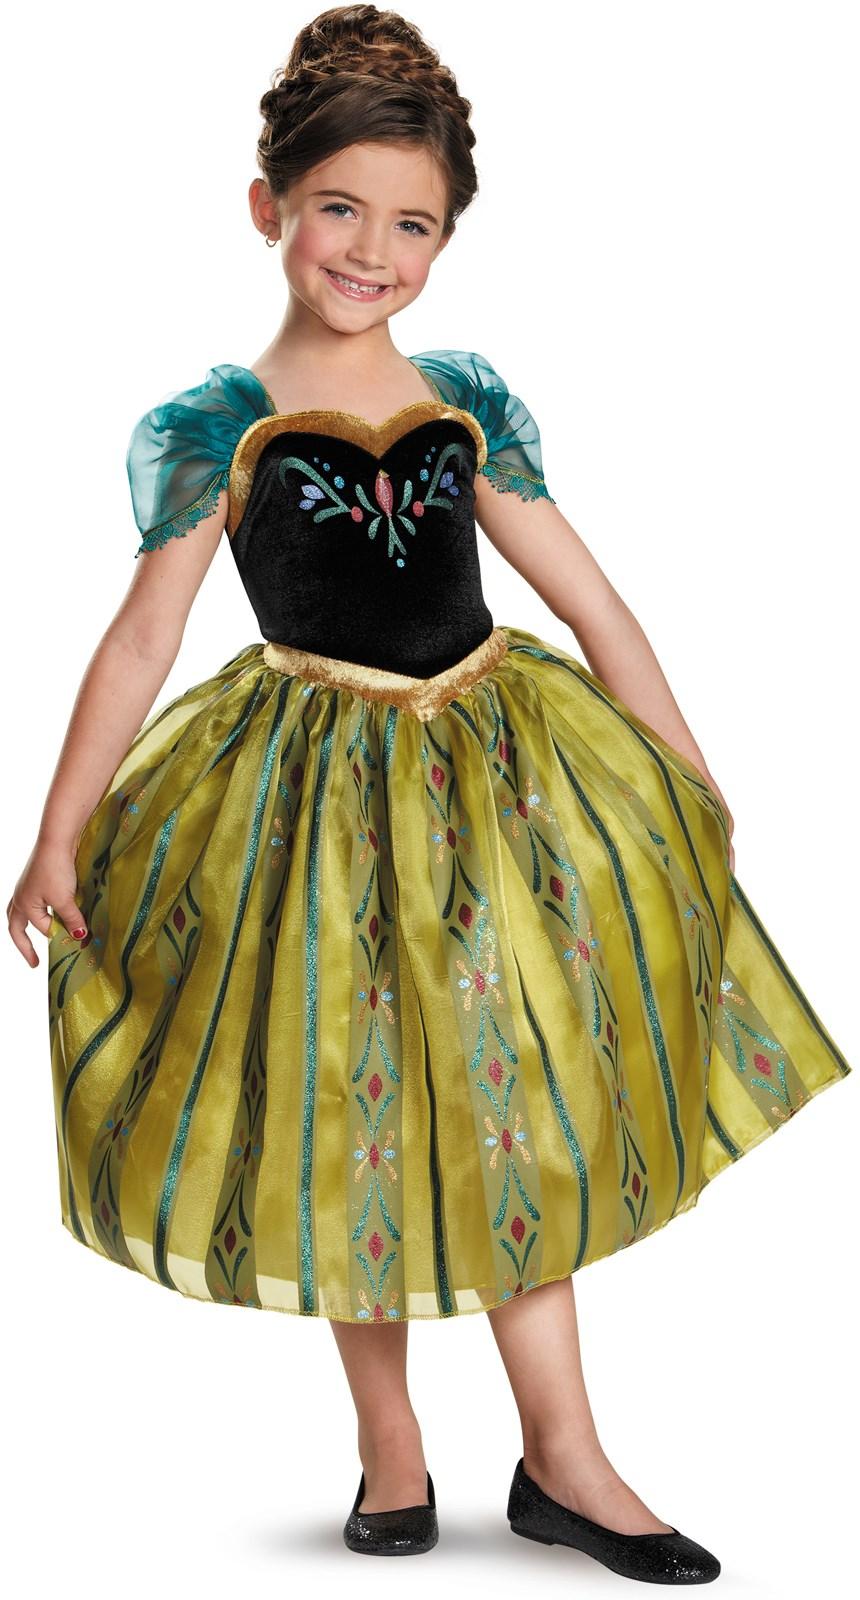 Frozen - Anna Coronation Deluxe Girls Costume